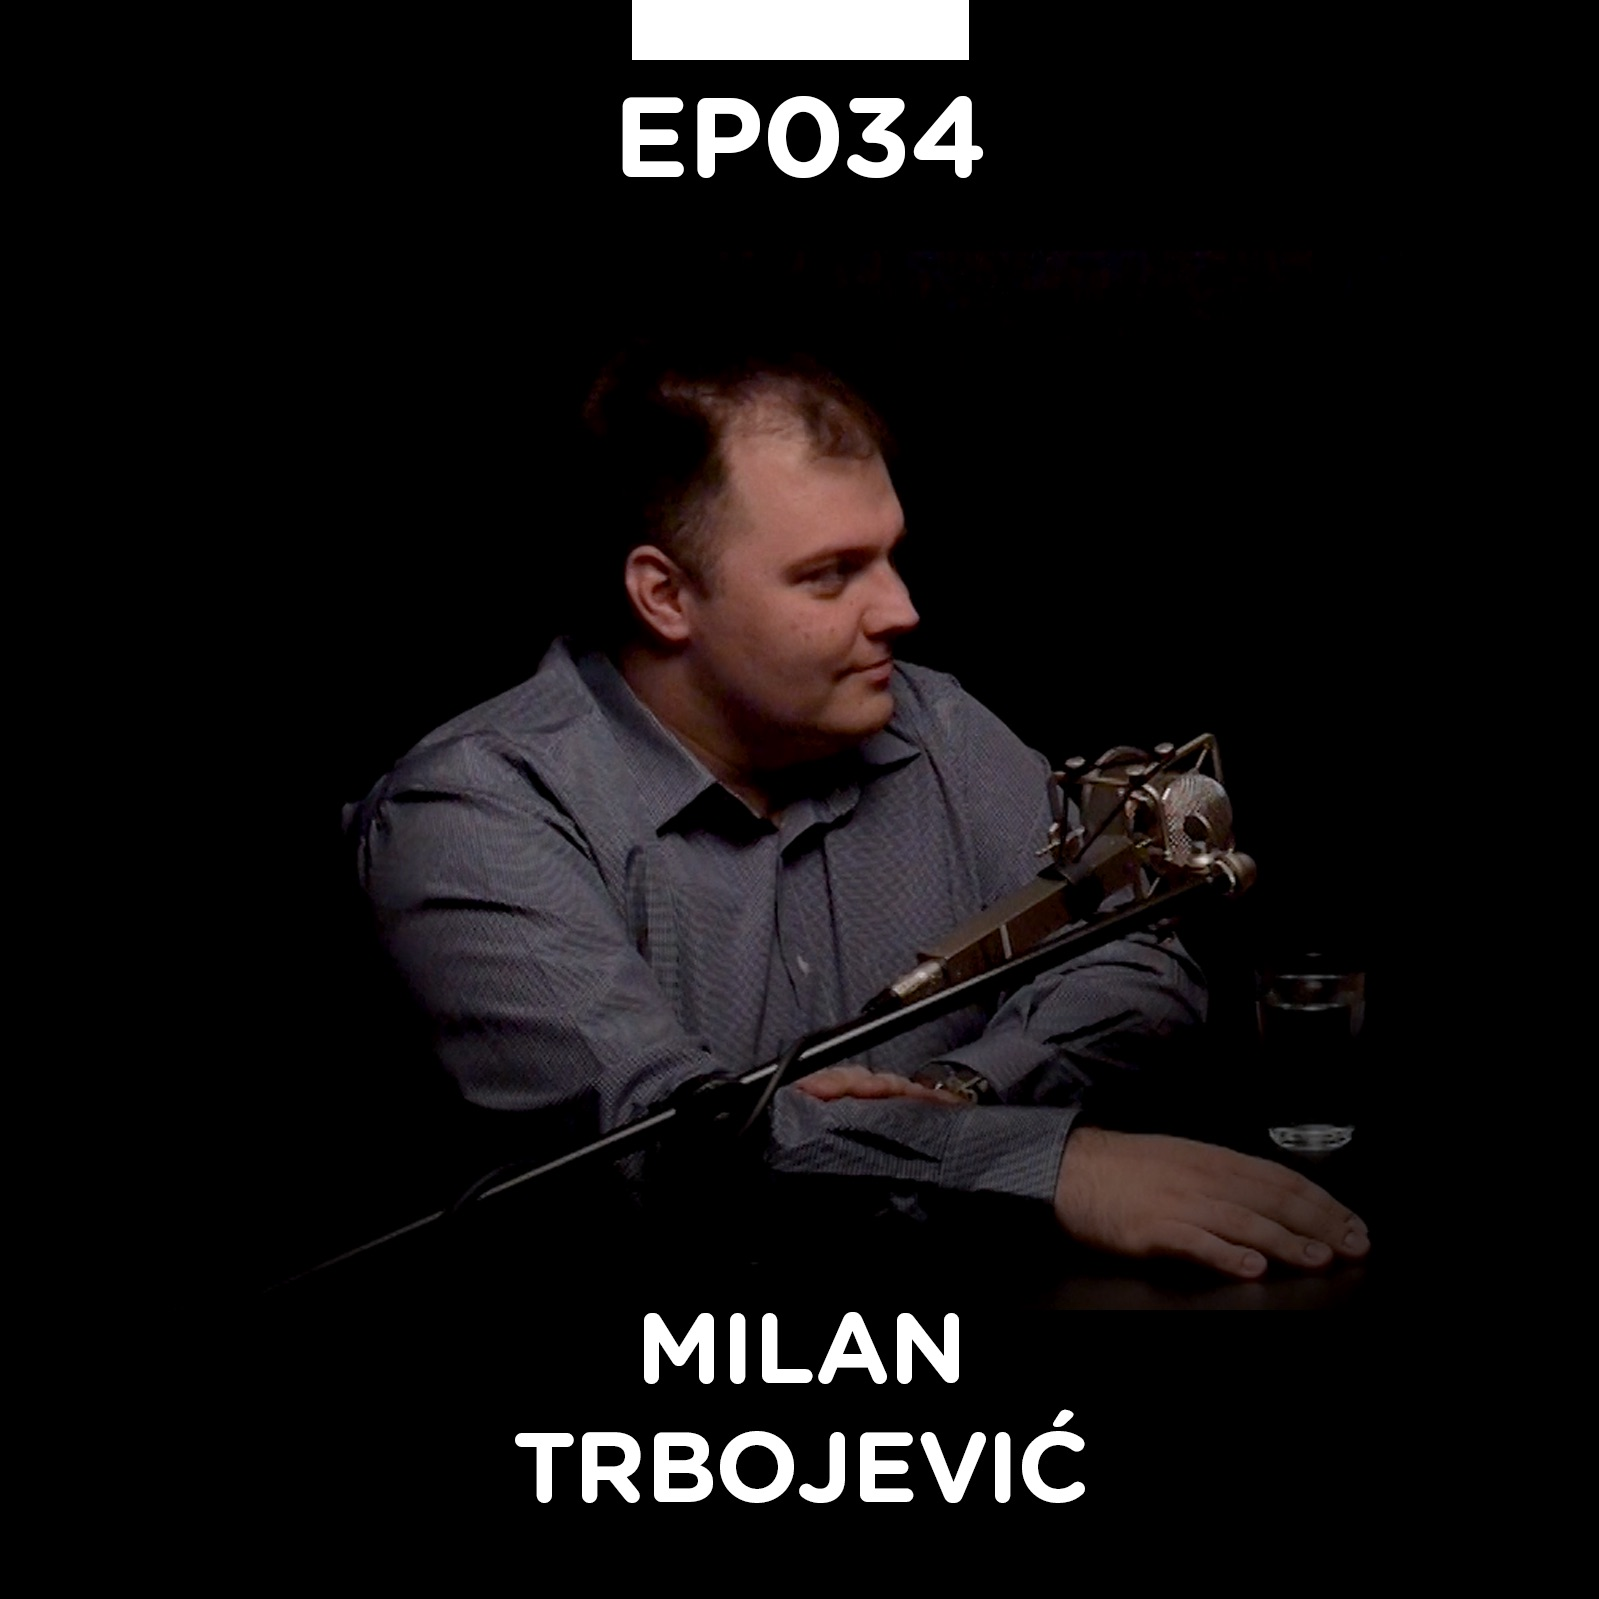 EP 034: Milan Trbojević, Knjiški Moljac - Pojačalo podcast